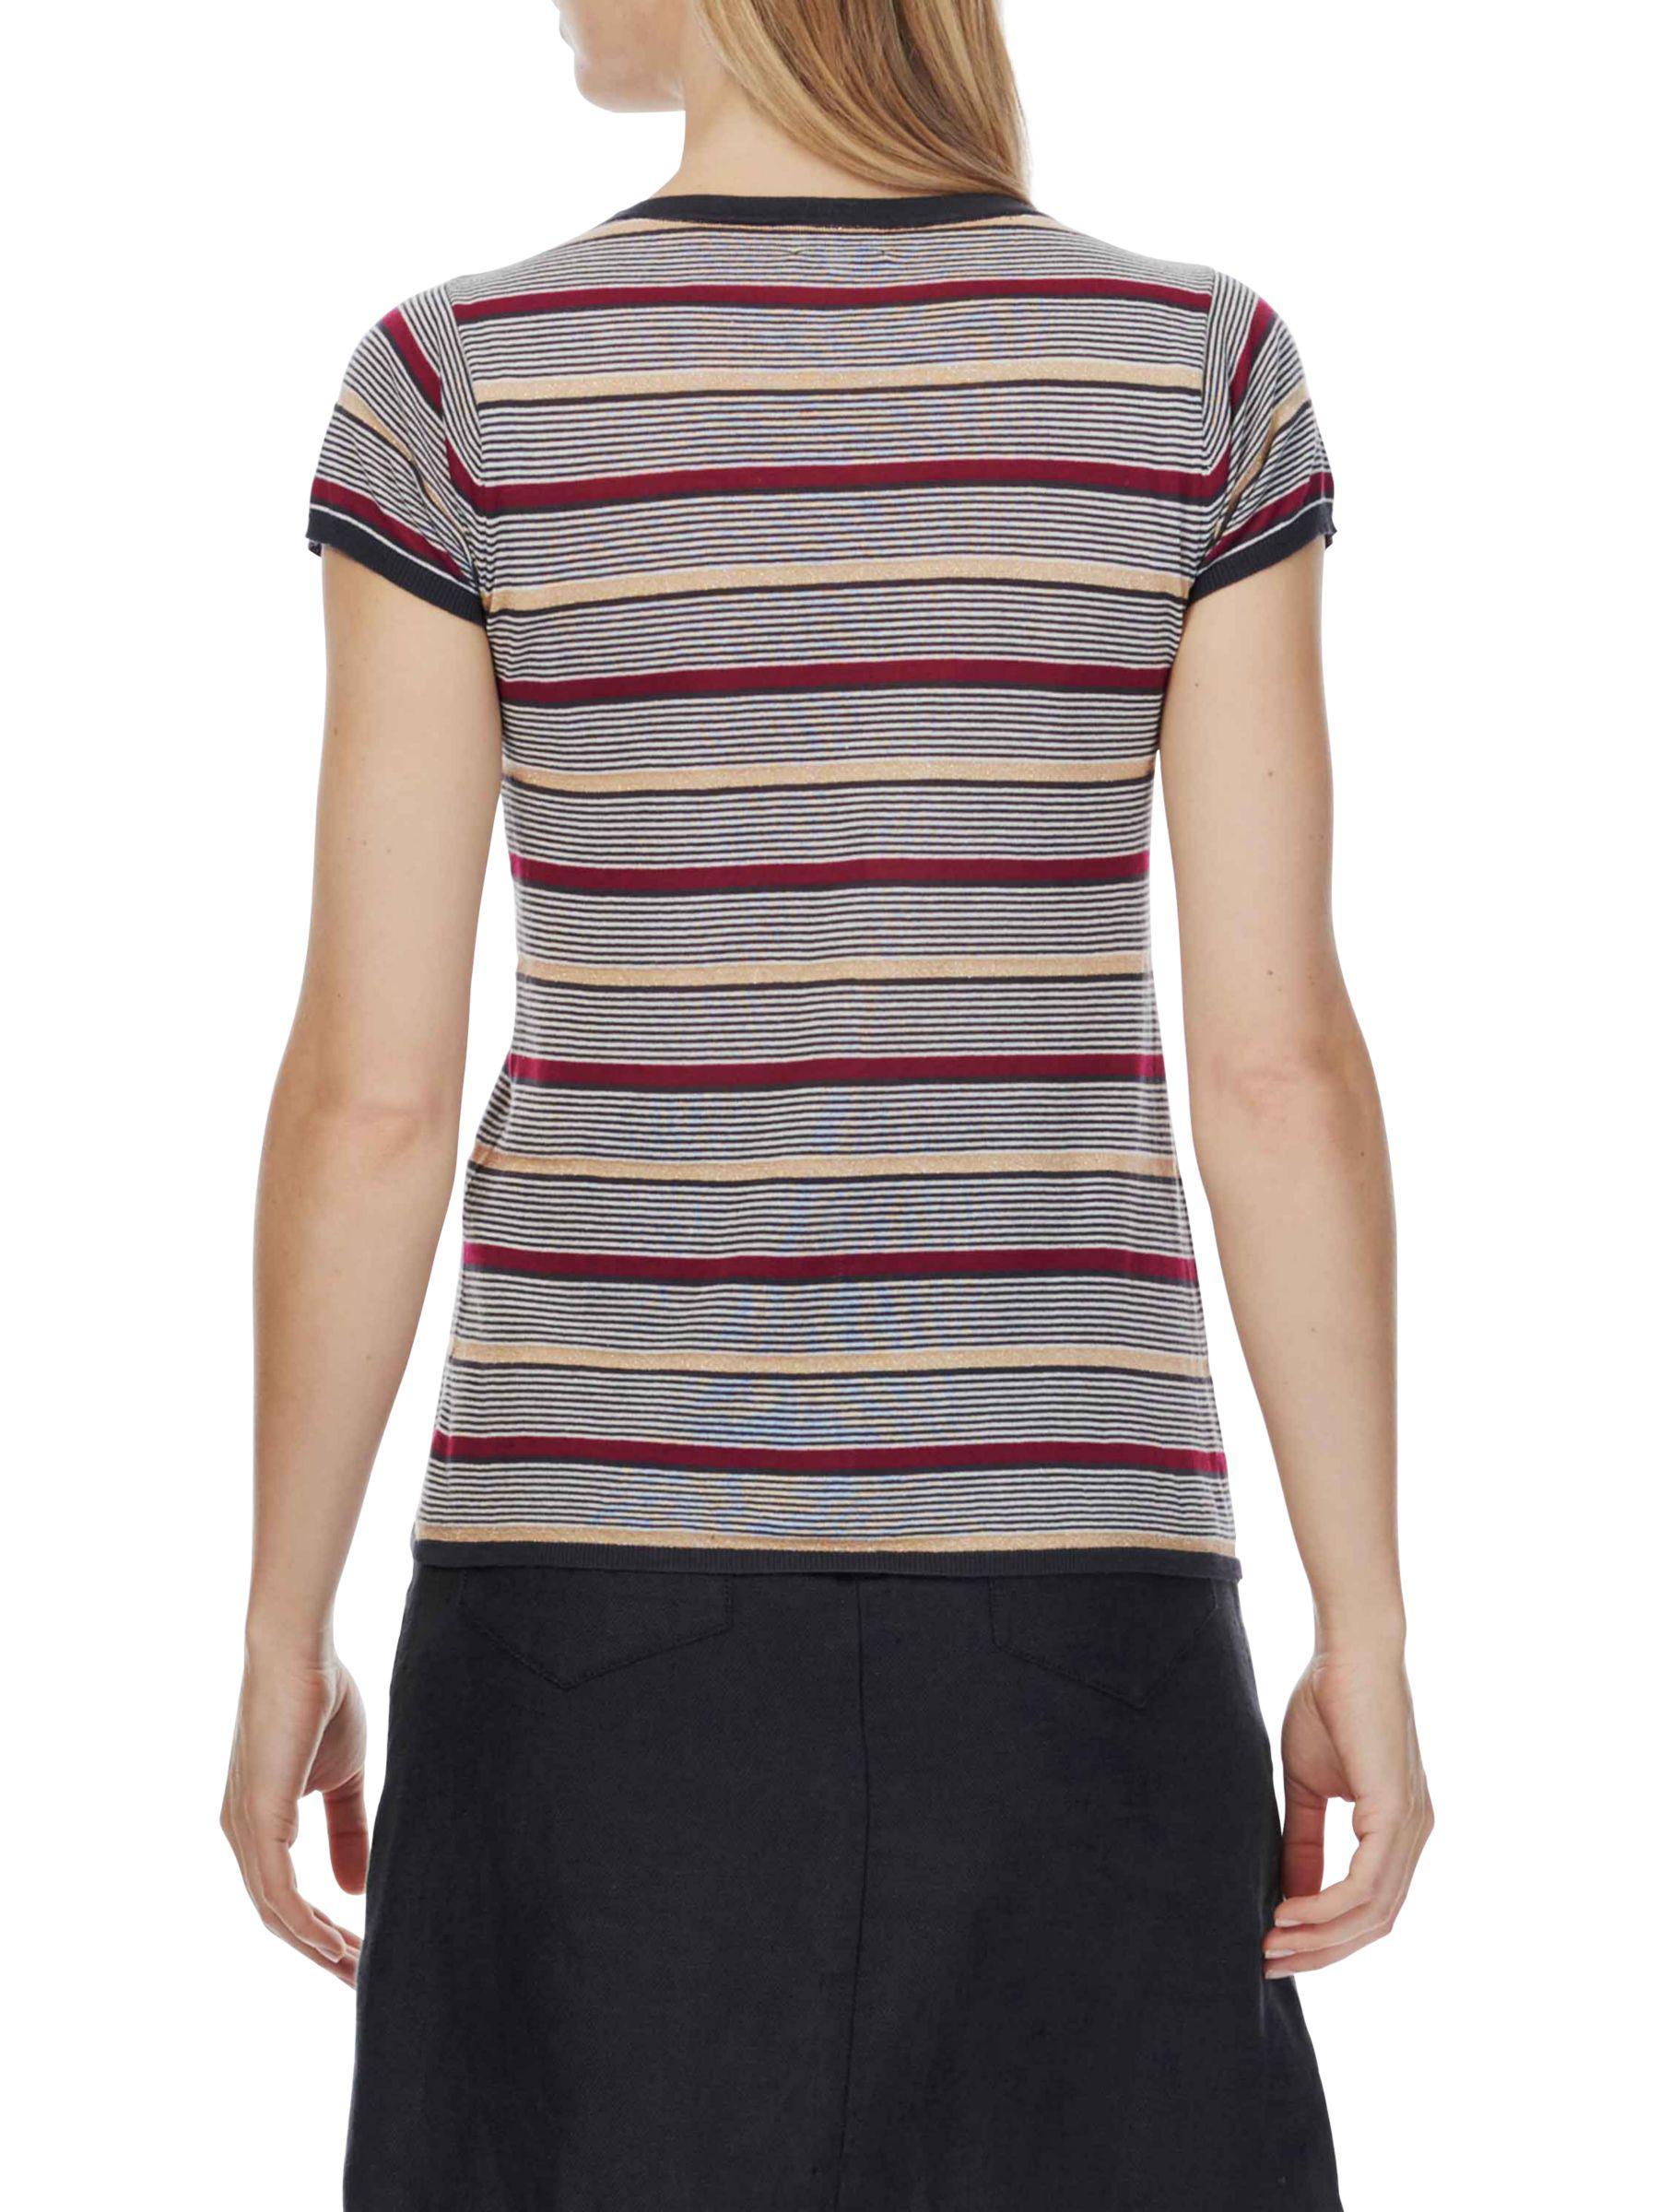 e22a764f4fe8d Brora Metallic Striped T-shirt - Lyst